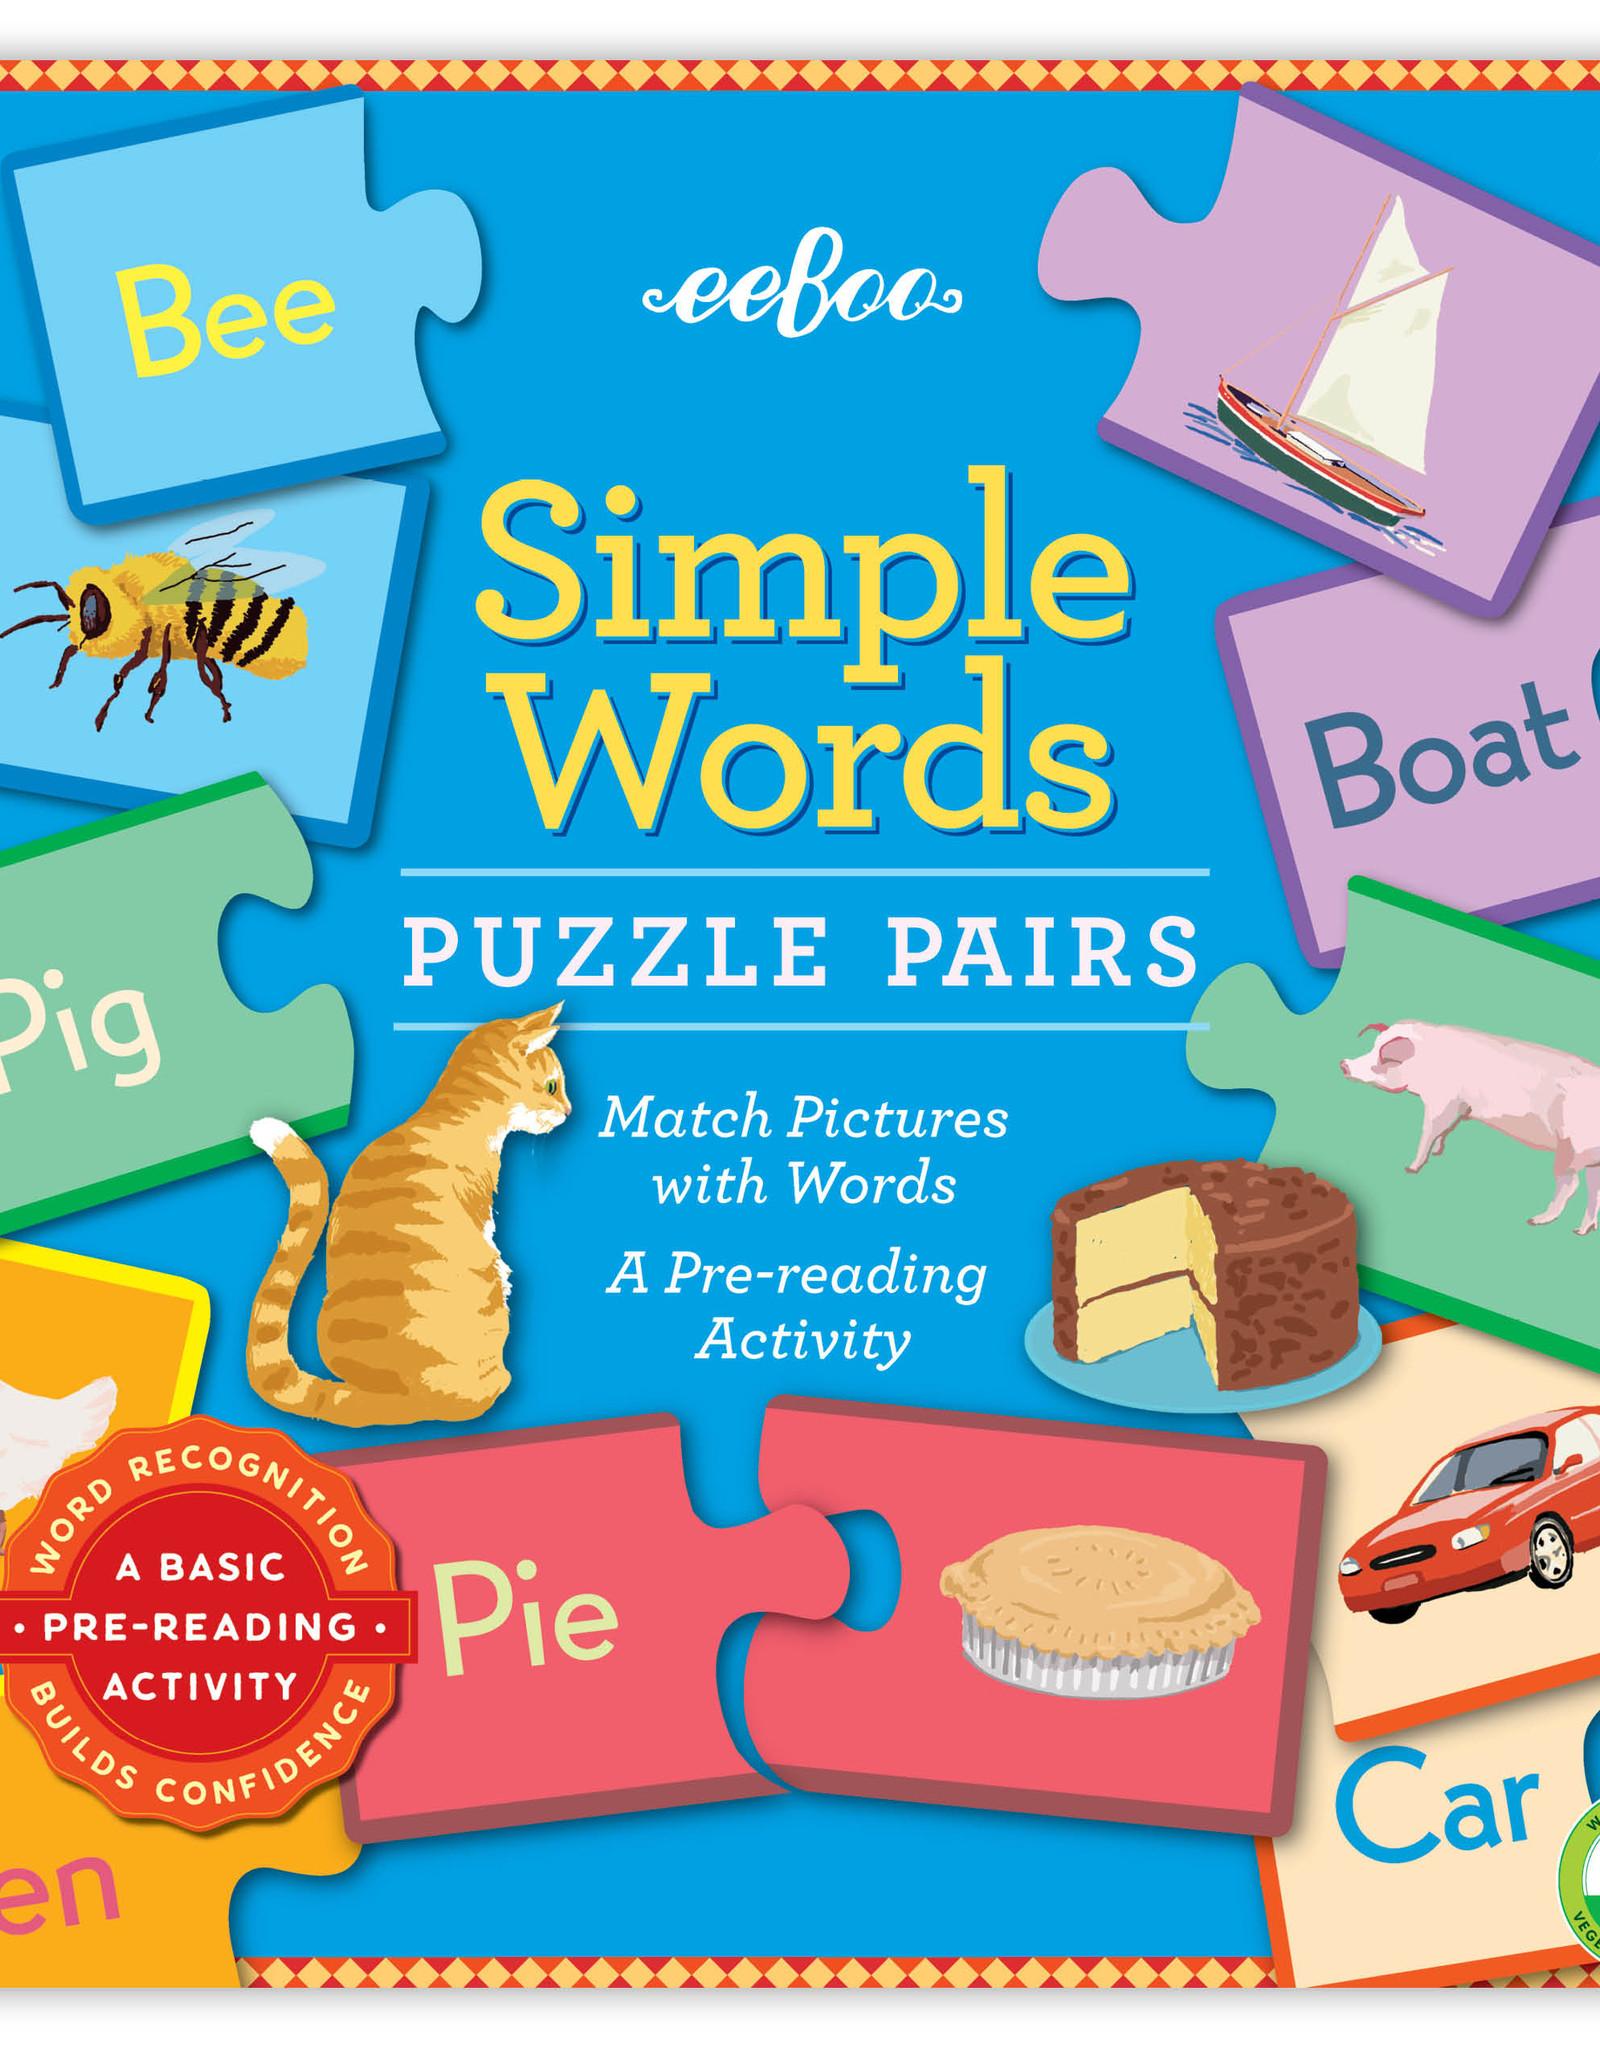 Eeboo Simple Words Puzzle Pairs